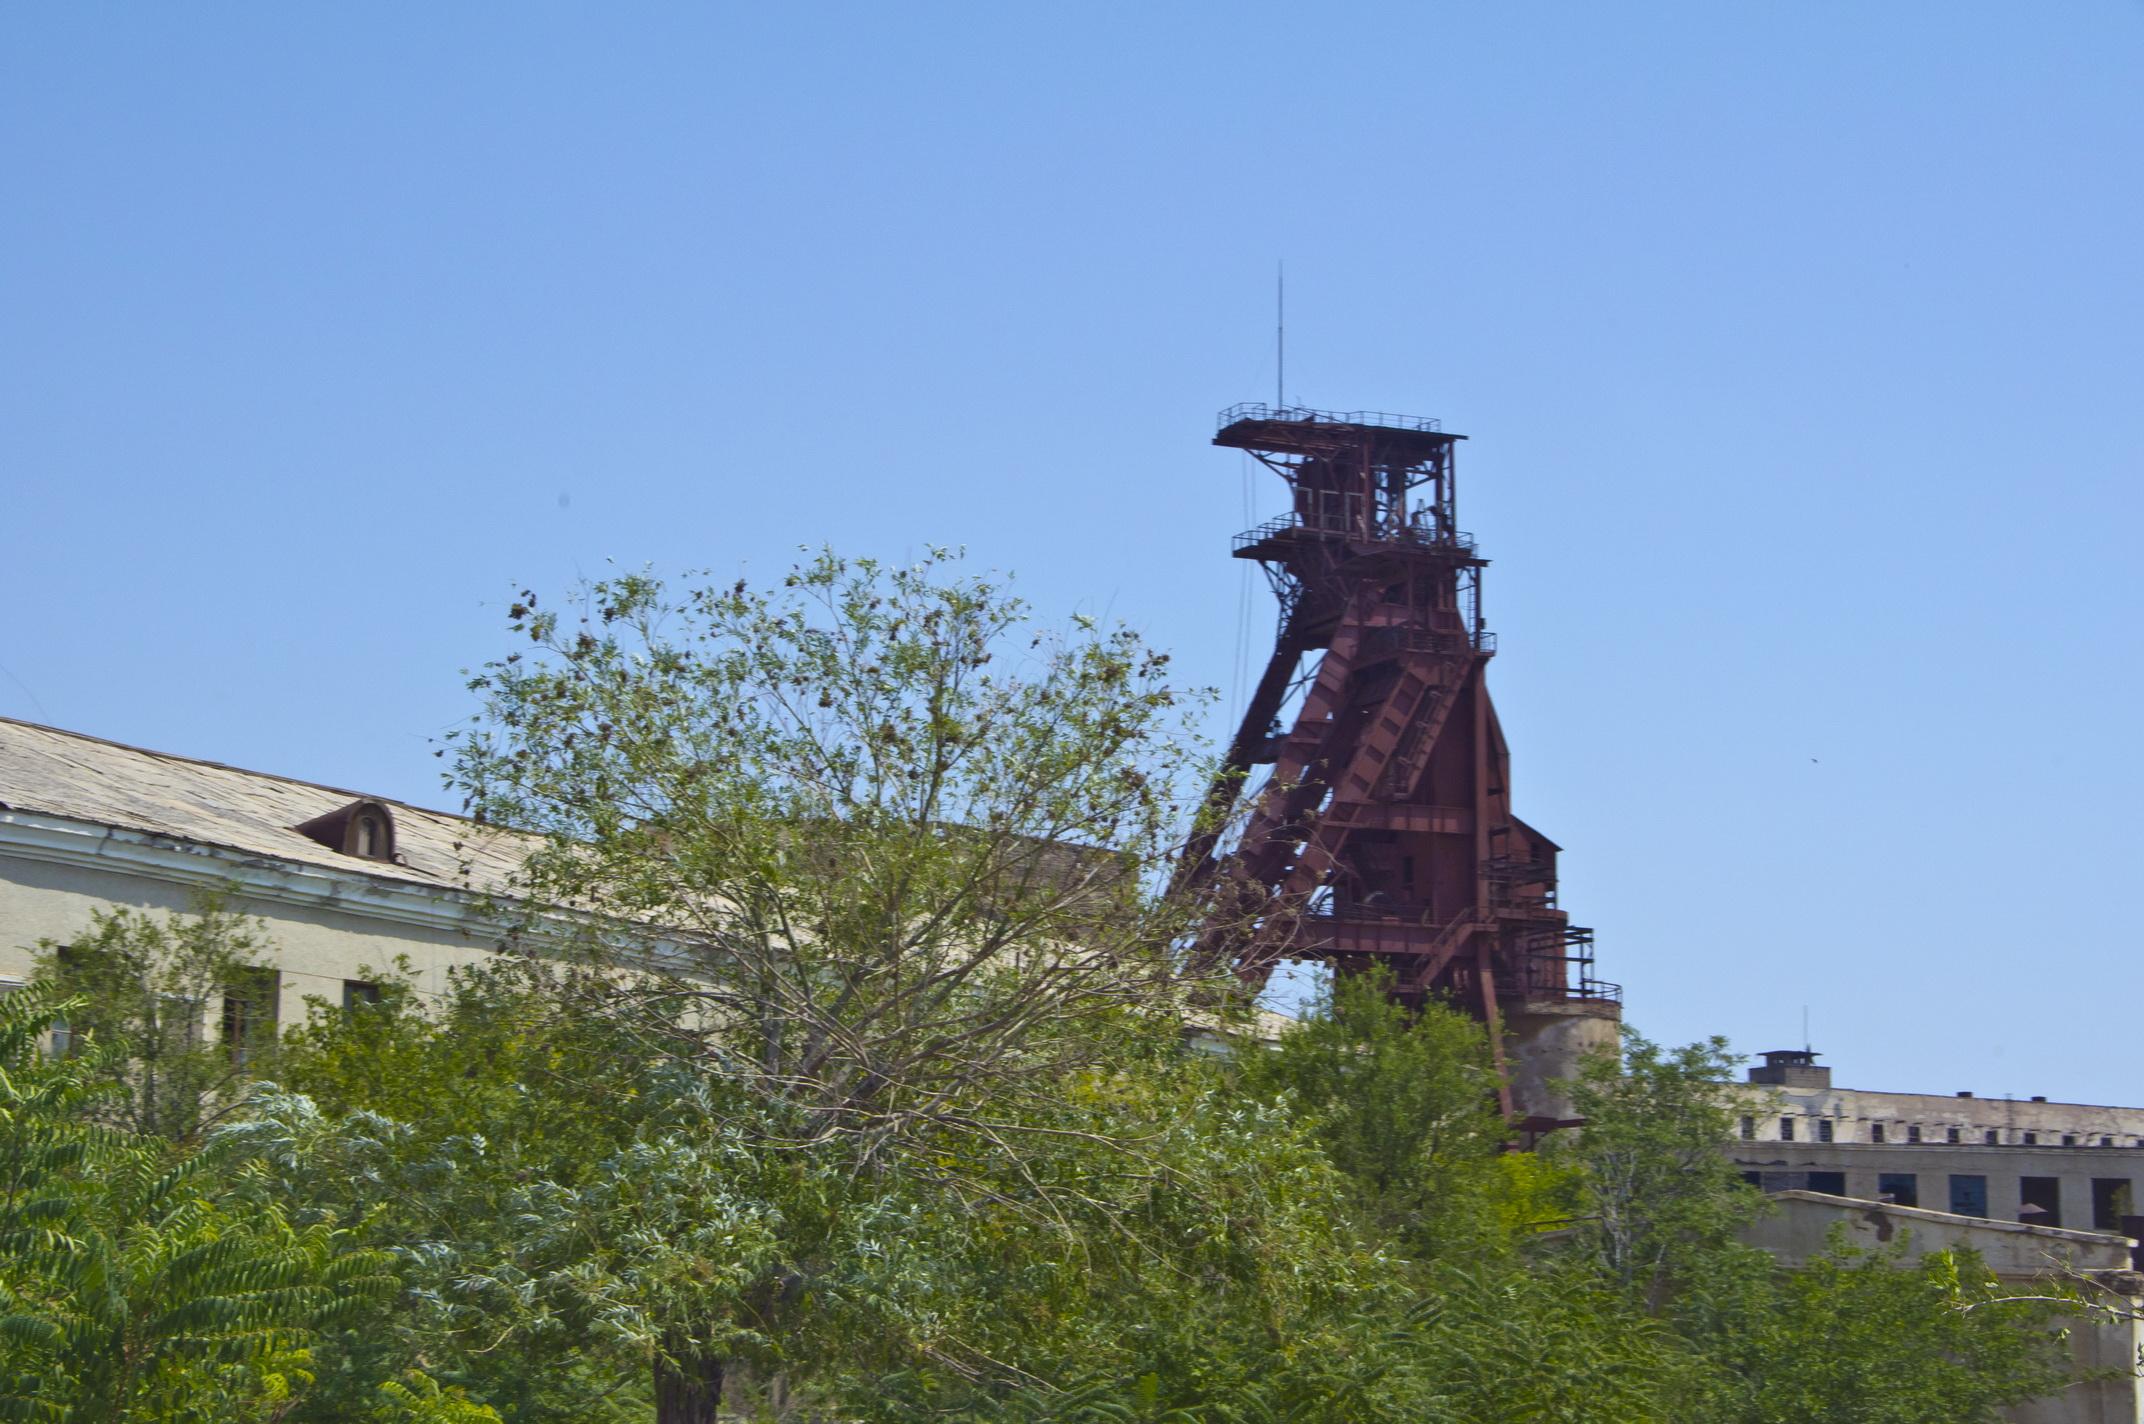 Рудники и производства г.Кентау 0_6ec74_ea4387fa_orig